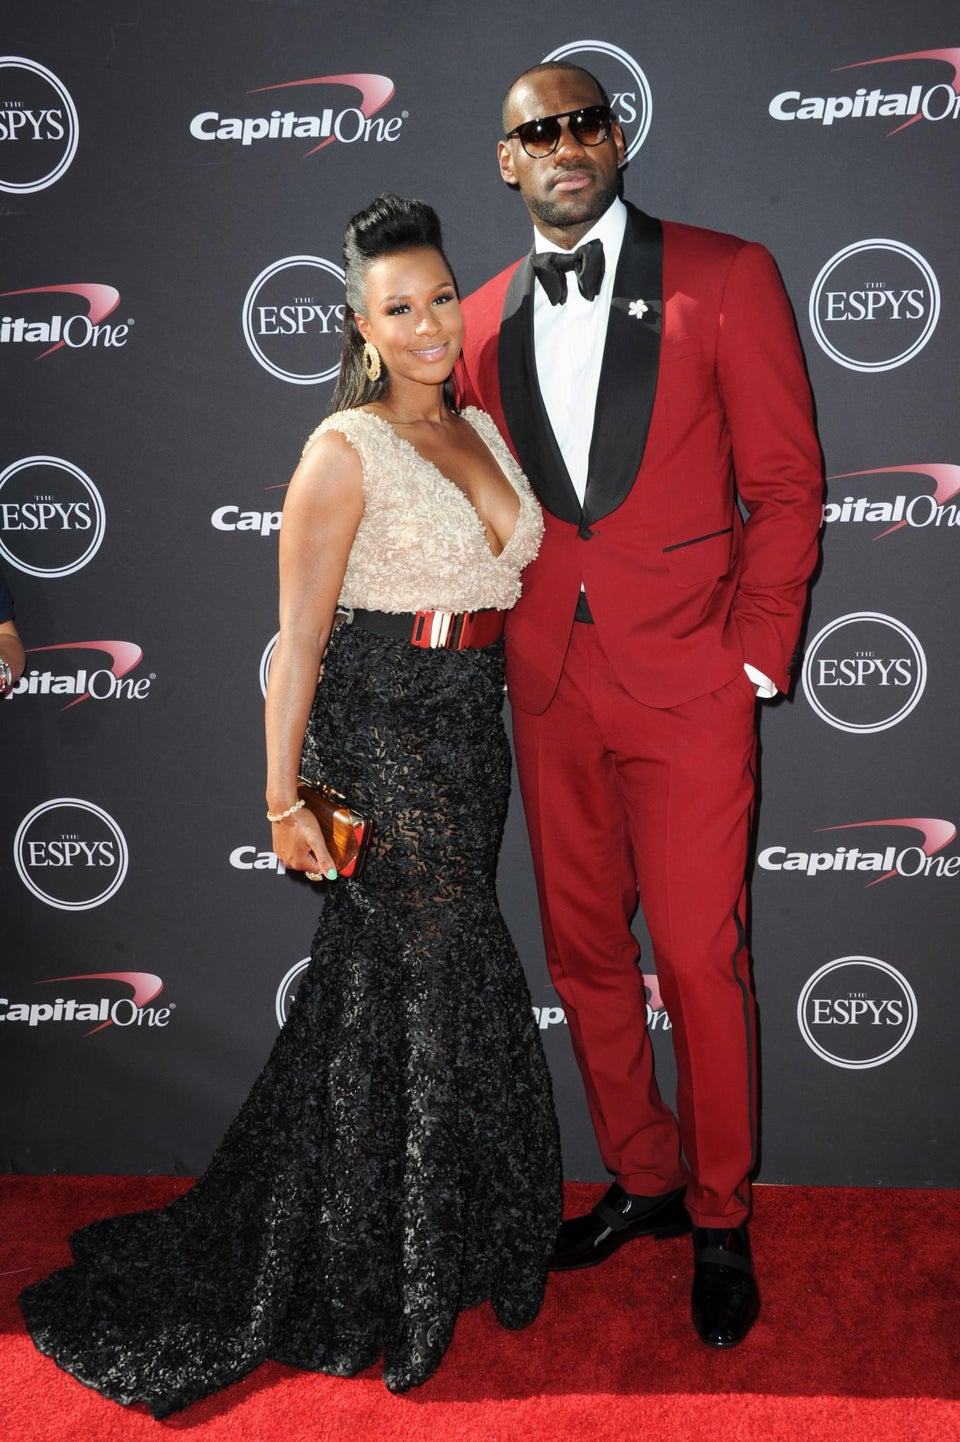 LeBron James & Savannah Brinson Tie the Knot in San Diego